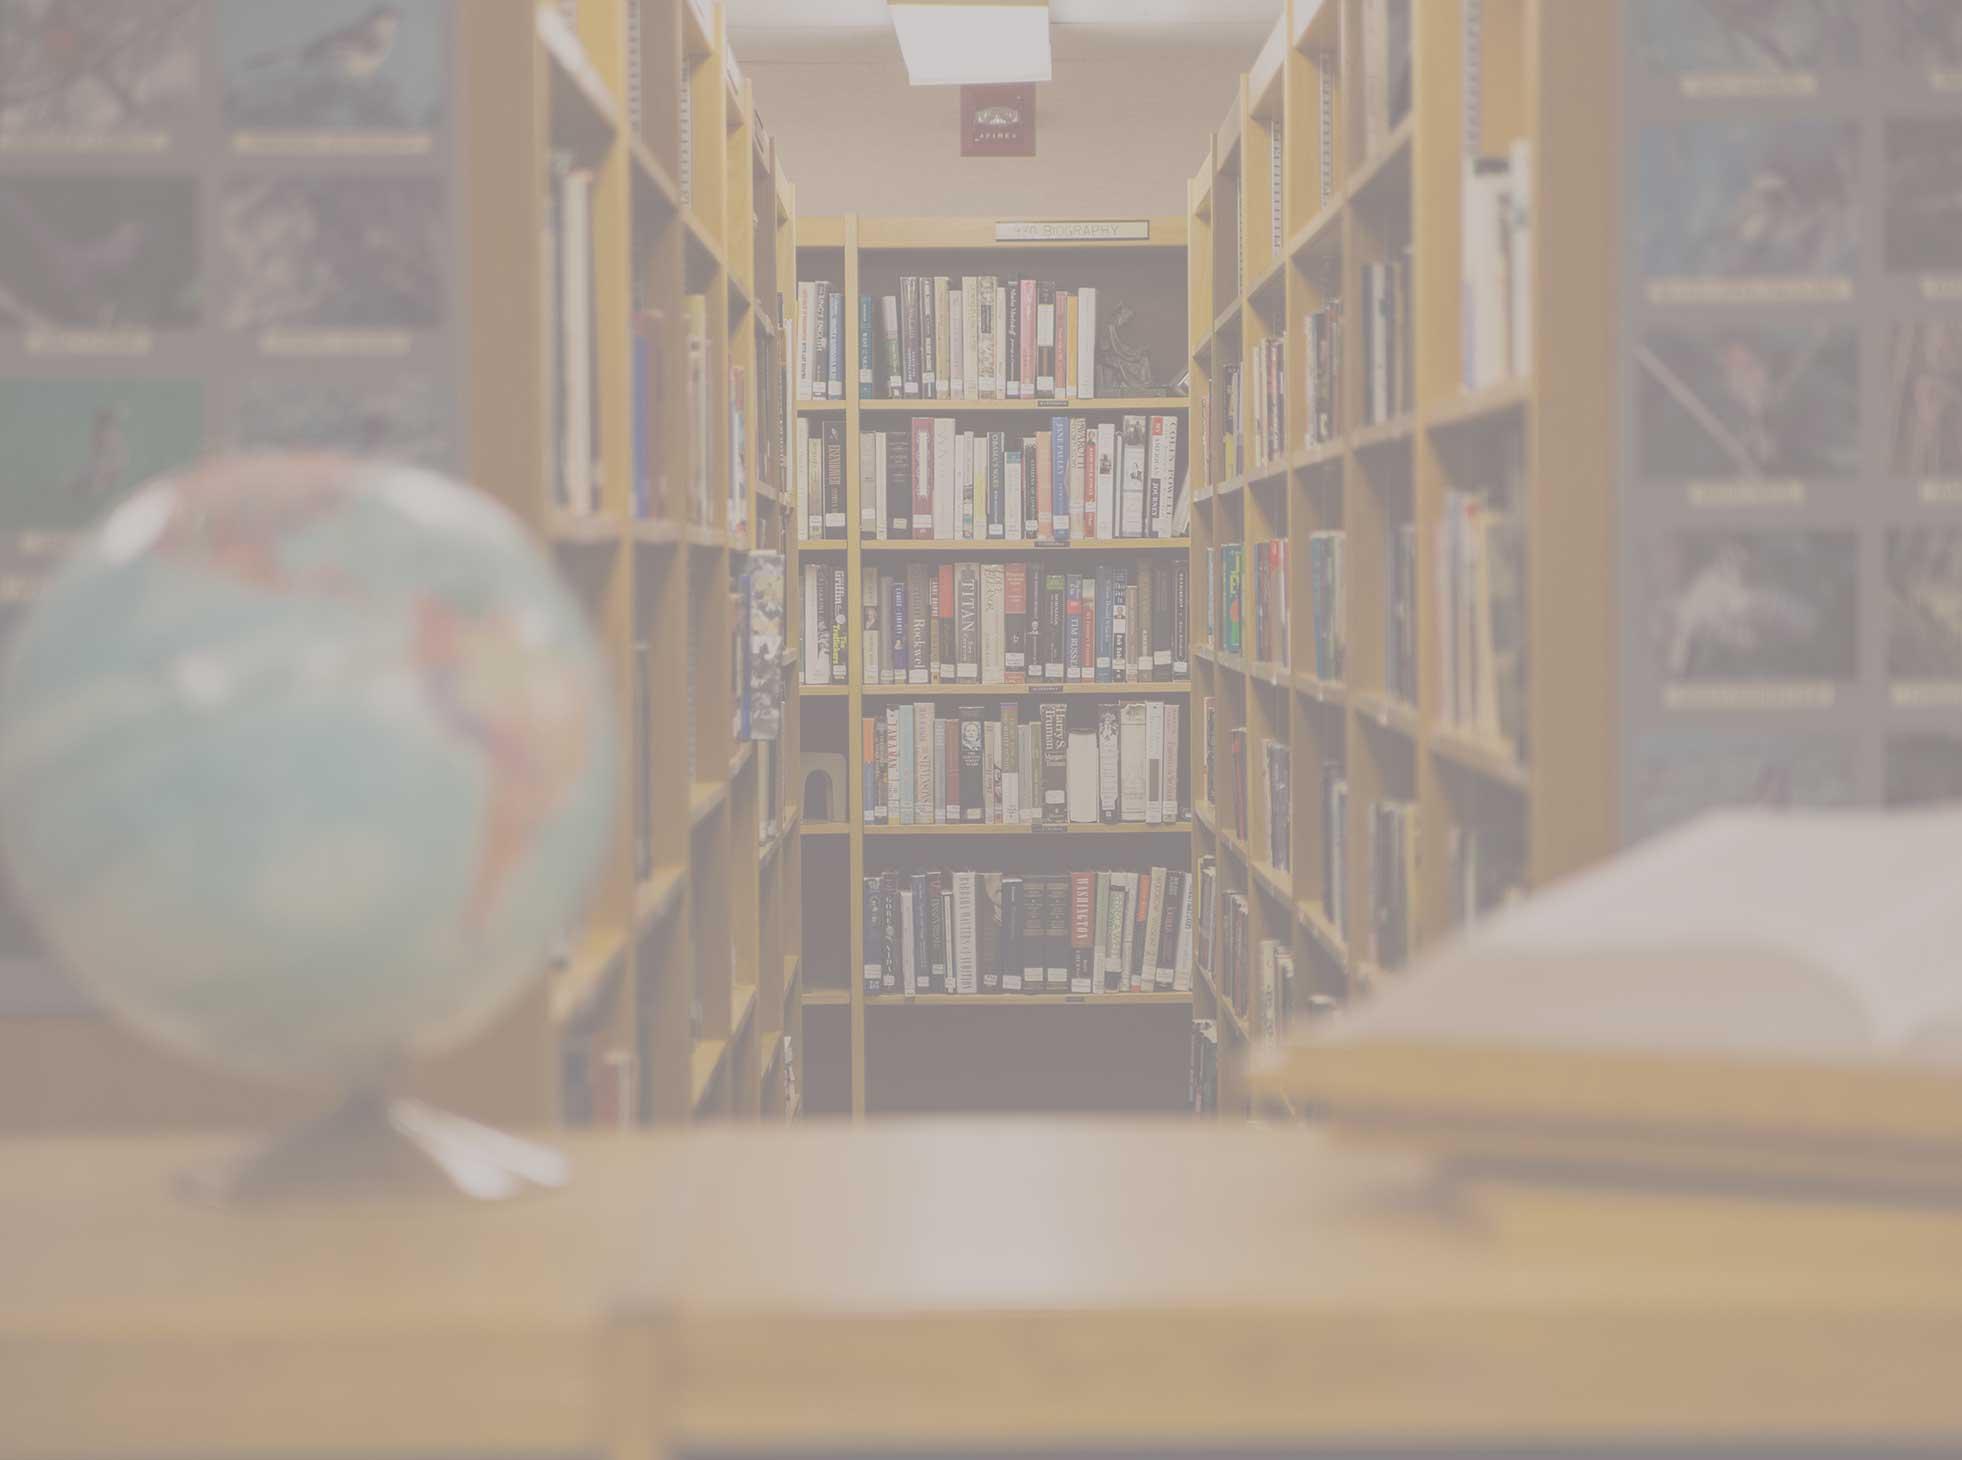 RPP - Library